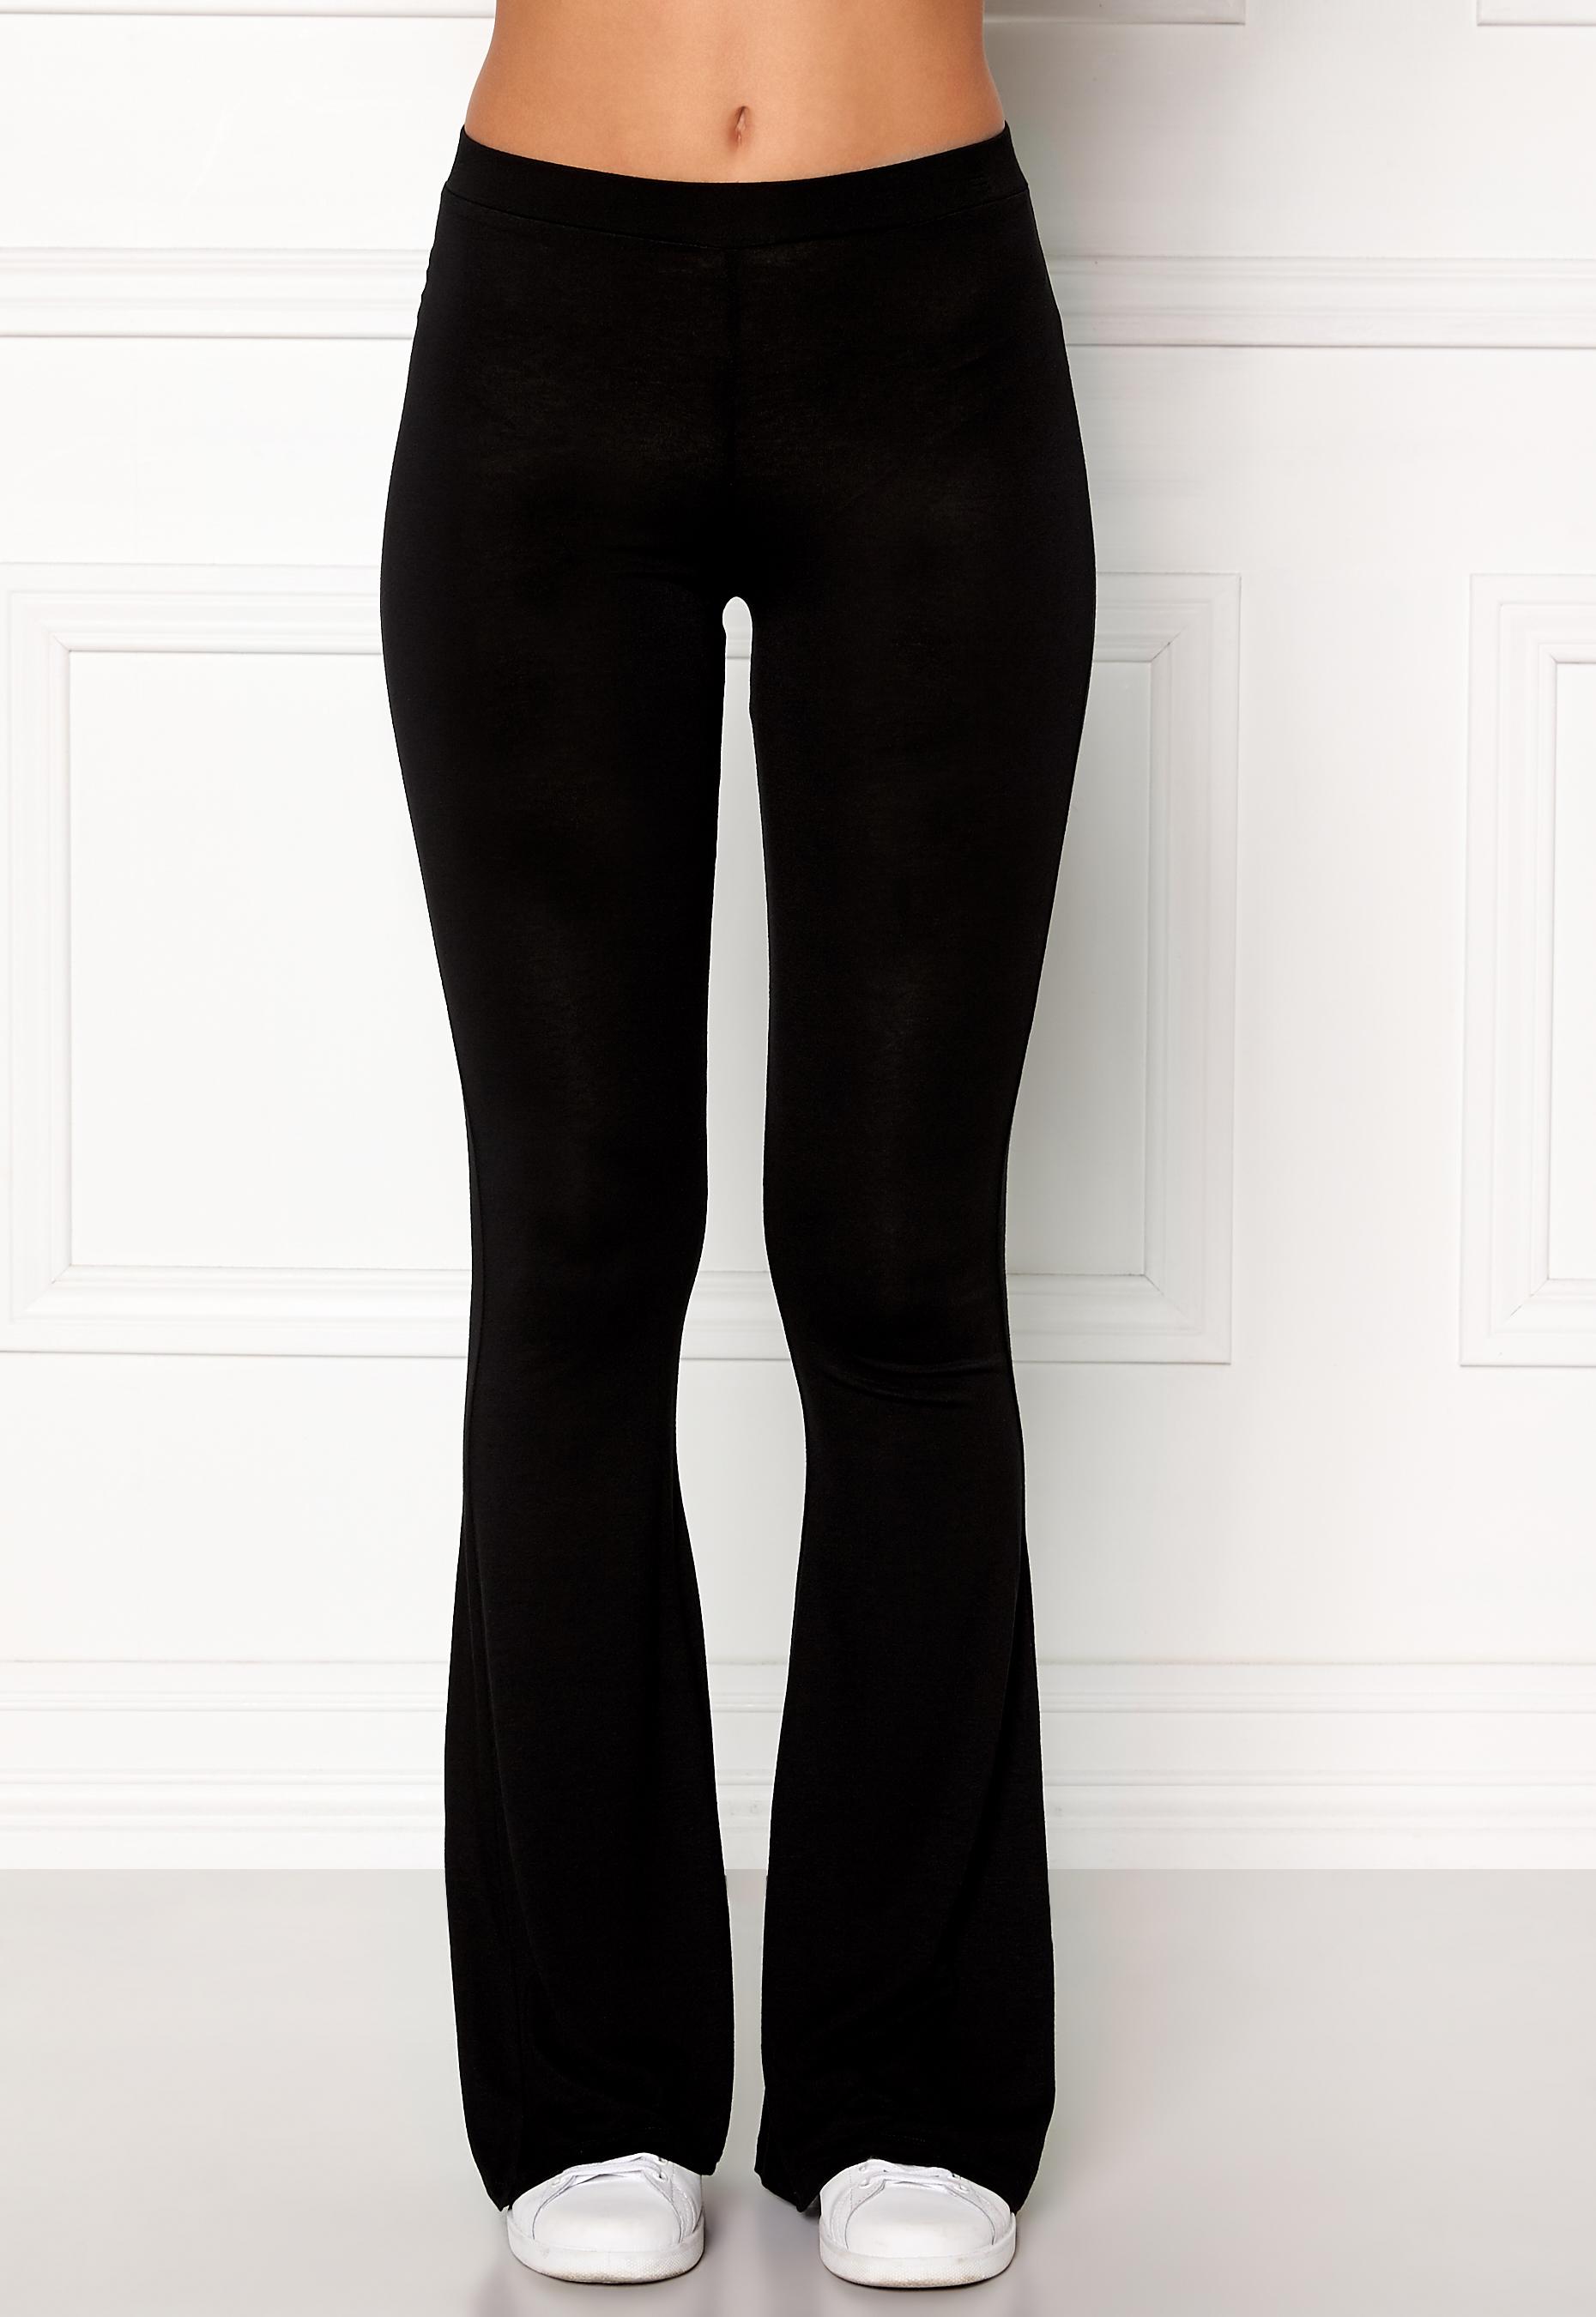 5a2571d5 77thFLEA Cozensa trousers Black - Bubbleroom